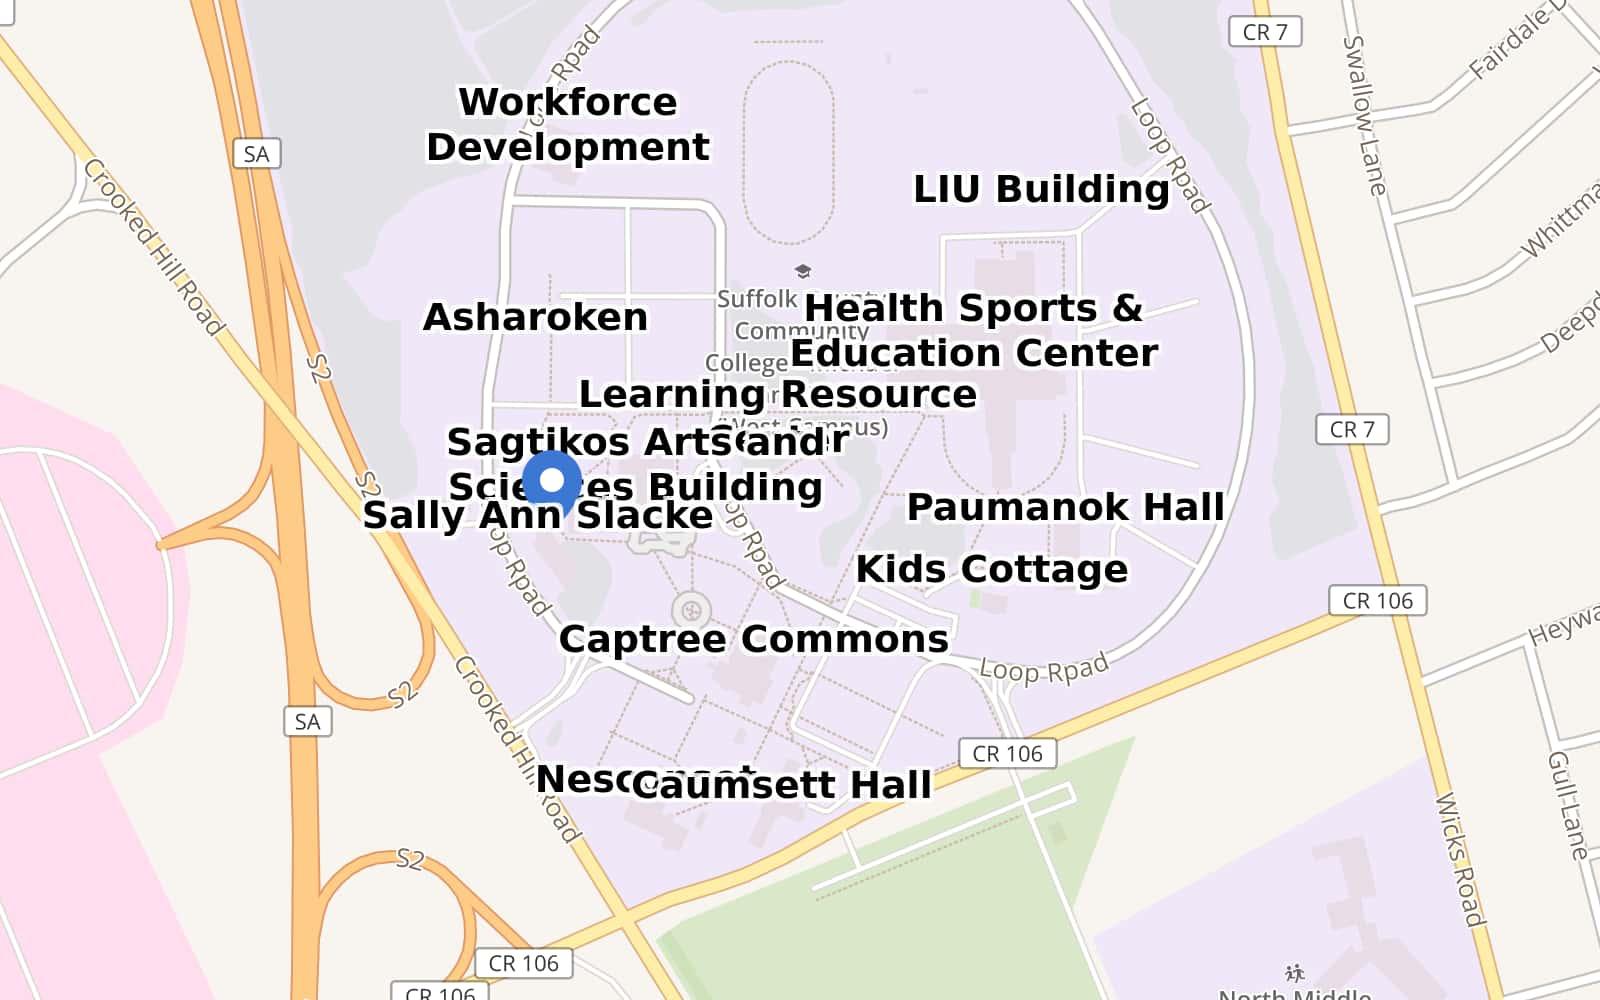 Sccc Grant Campus Map.Grant Campus Sccc By Steveevanssbu Maphub